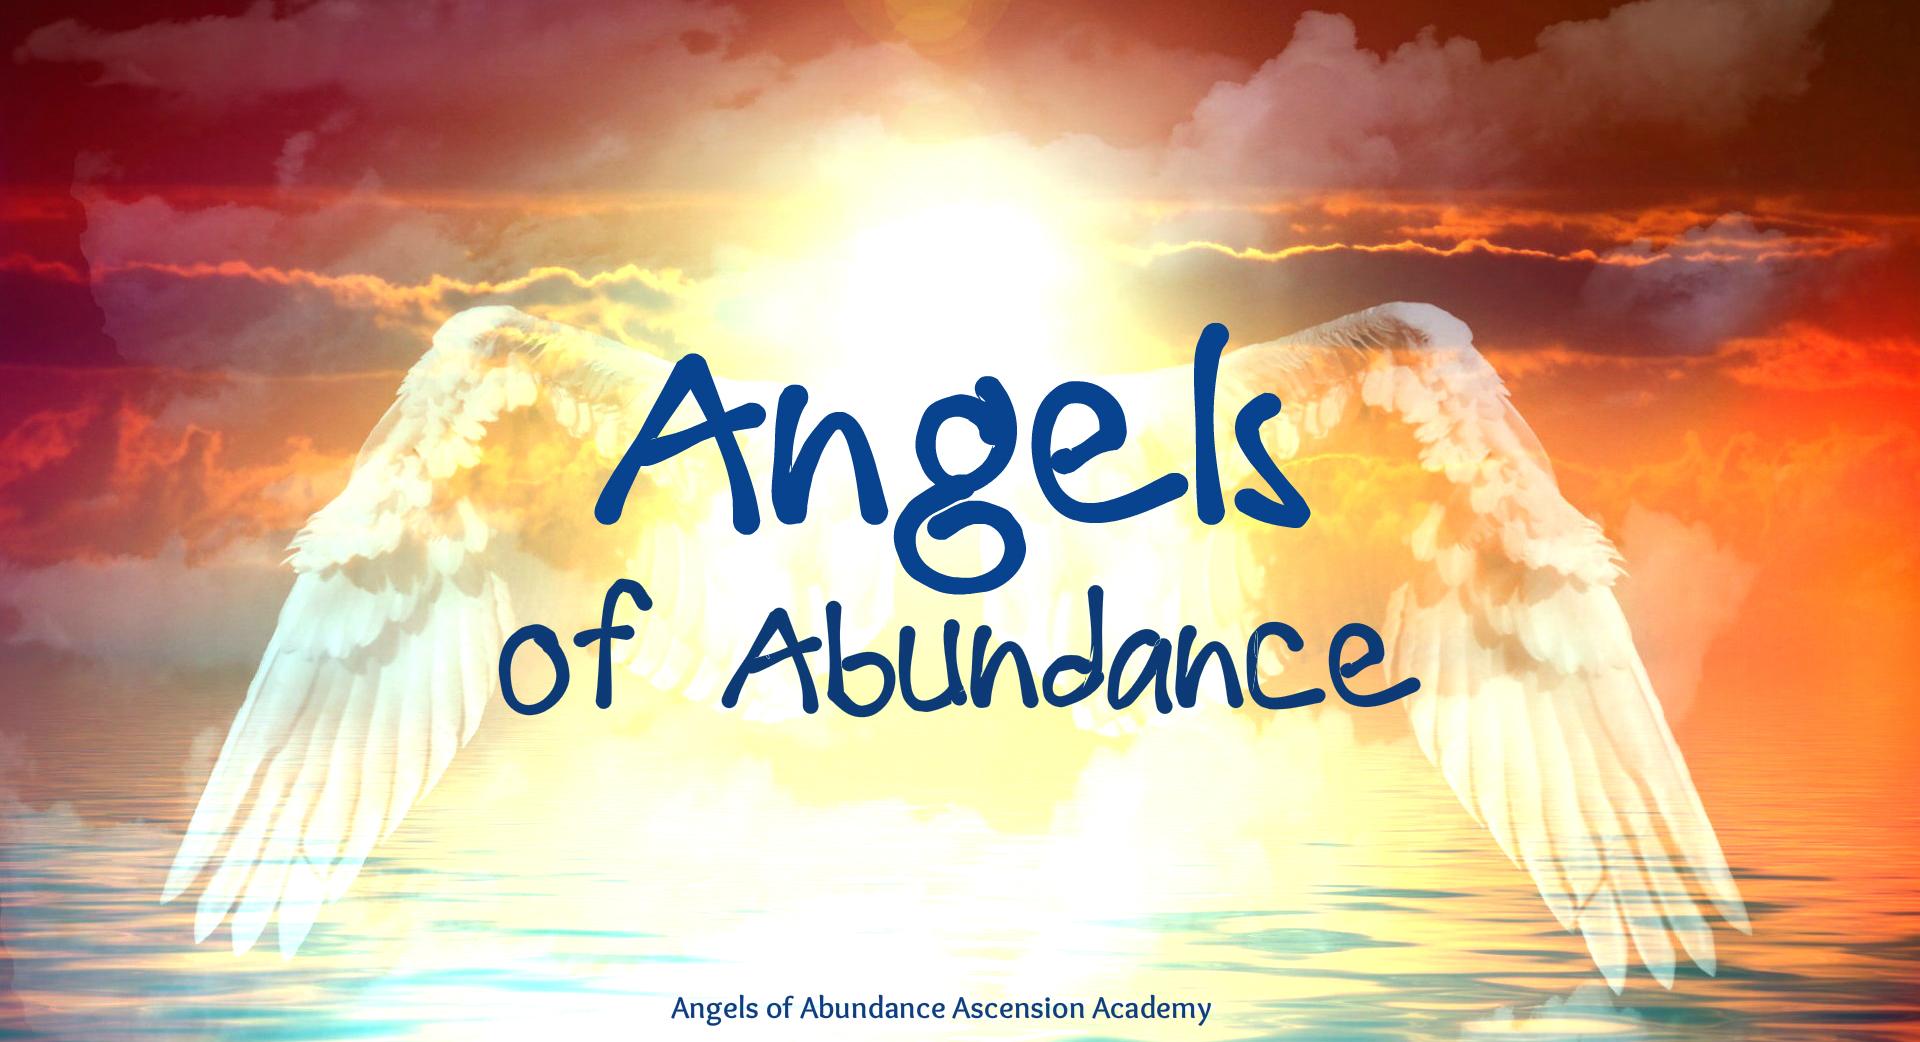 Angels of Abundance new